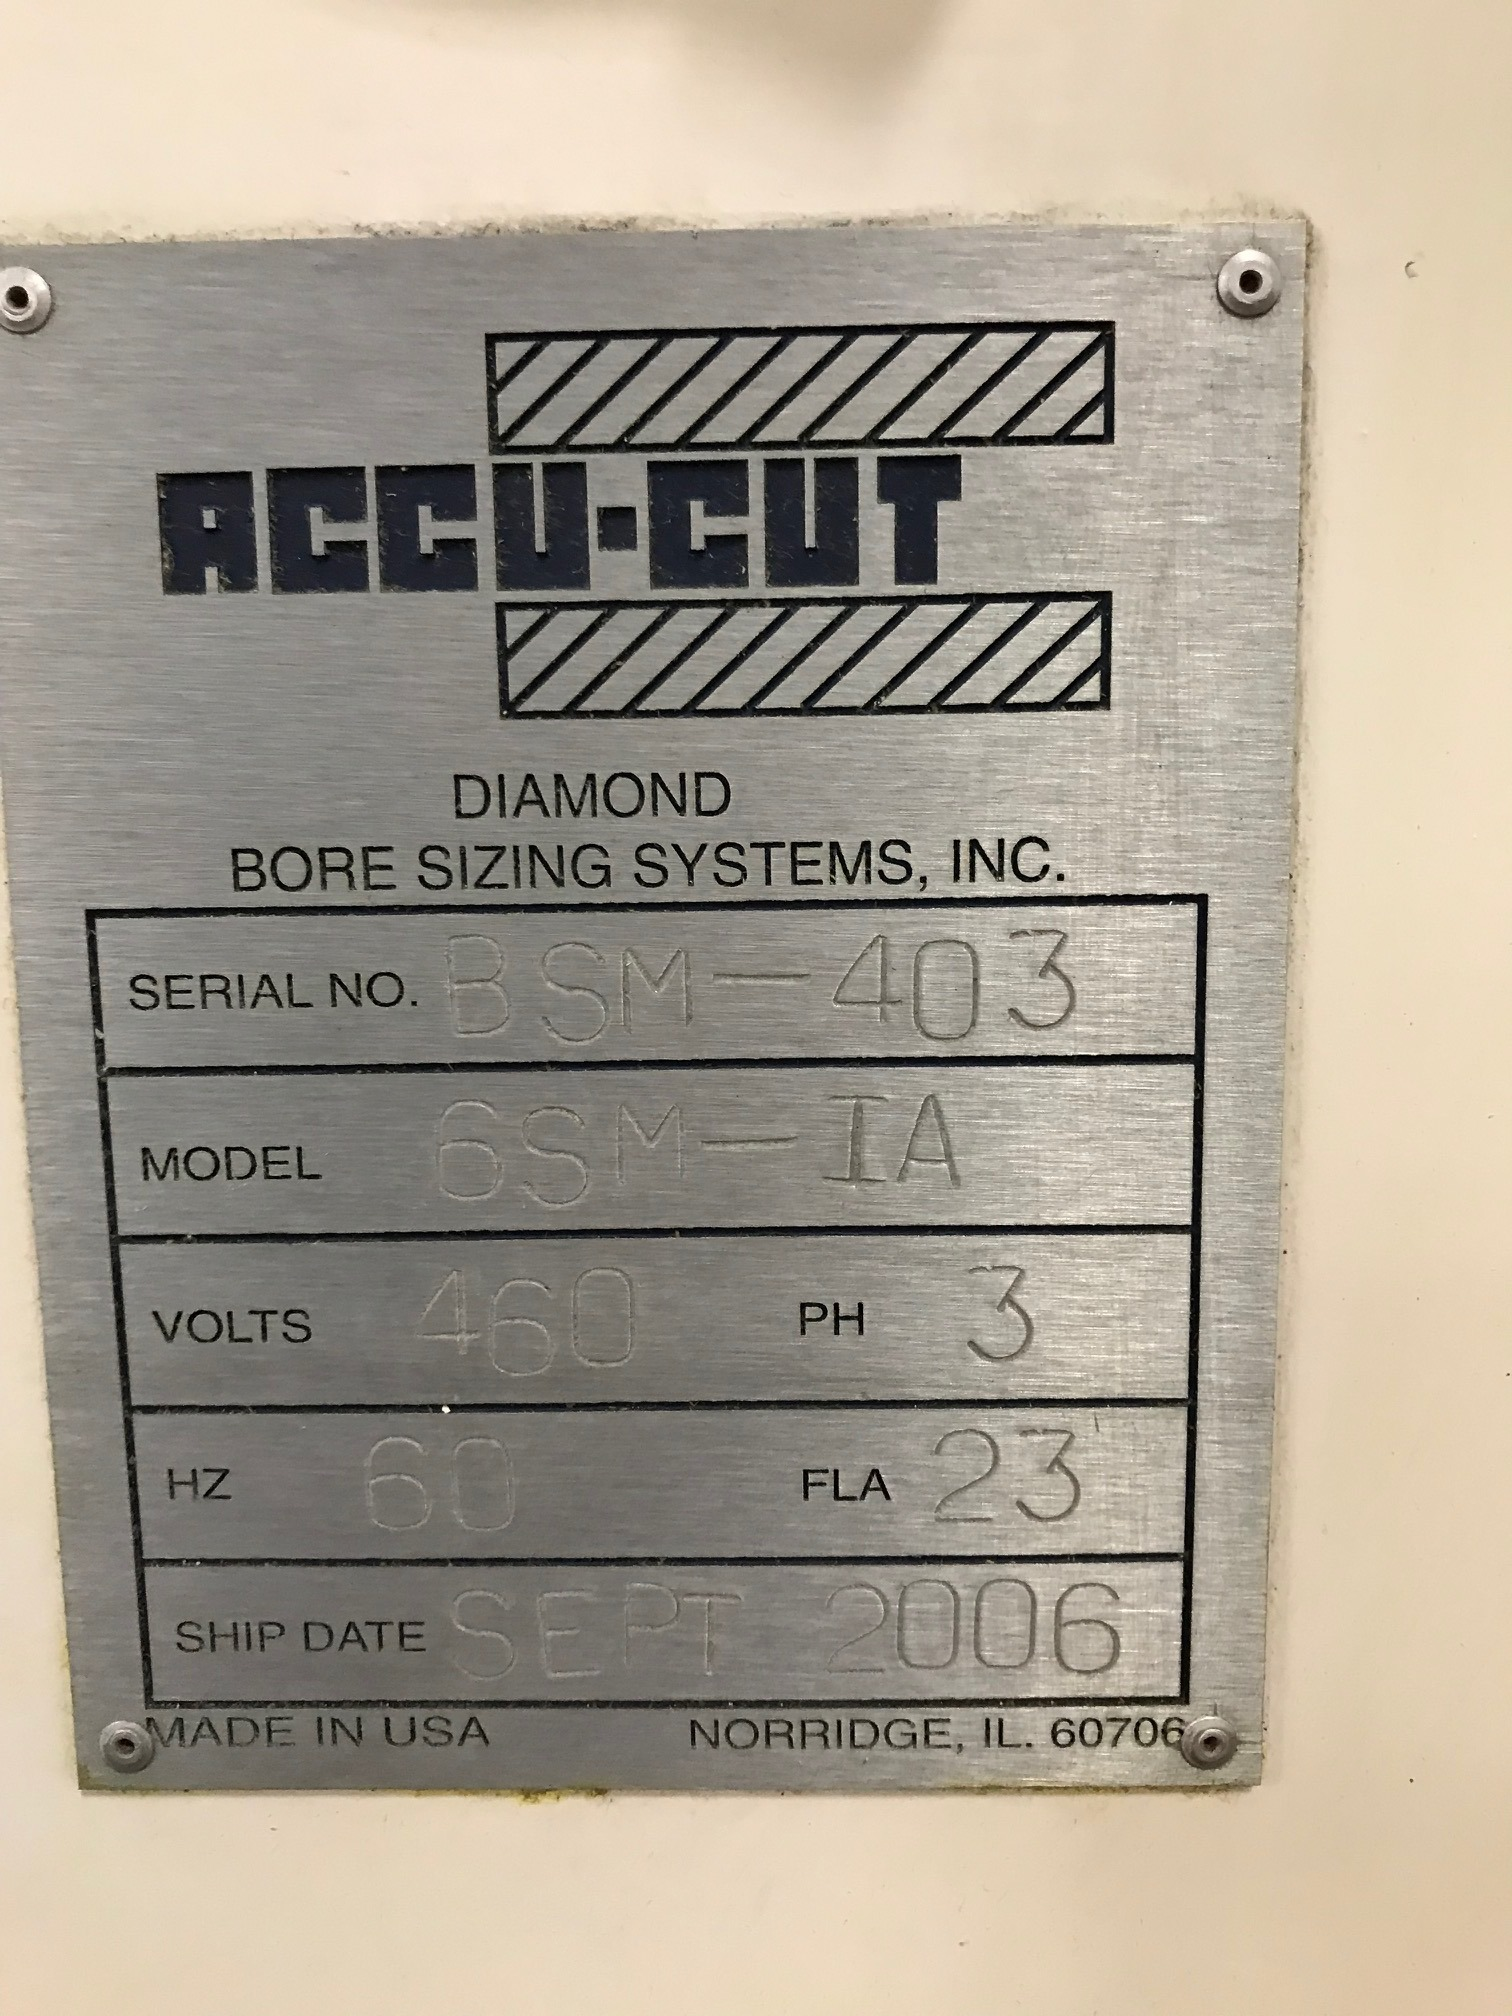 Lot 1 - ACCU-CUT DIAMOND BORE SIZING SYSTEM HONE, MODEL 6SM-IA, SN BSM-403, YEAR 2006, LOCATION IL